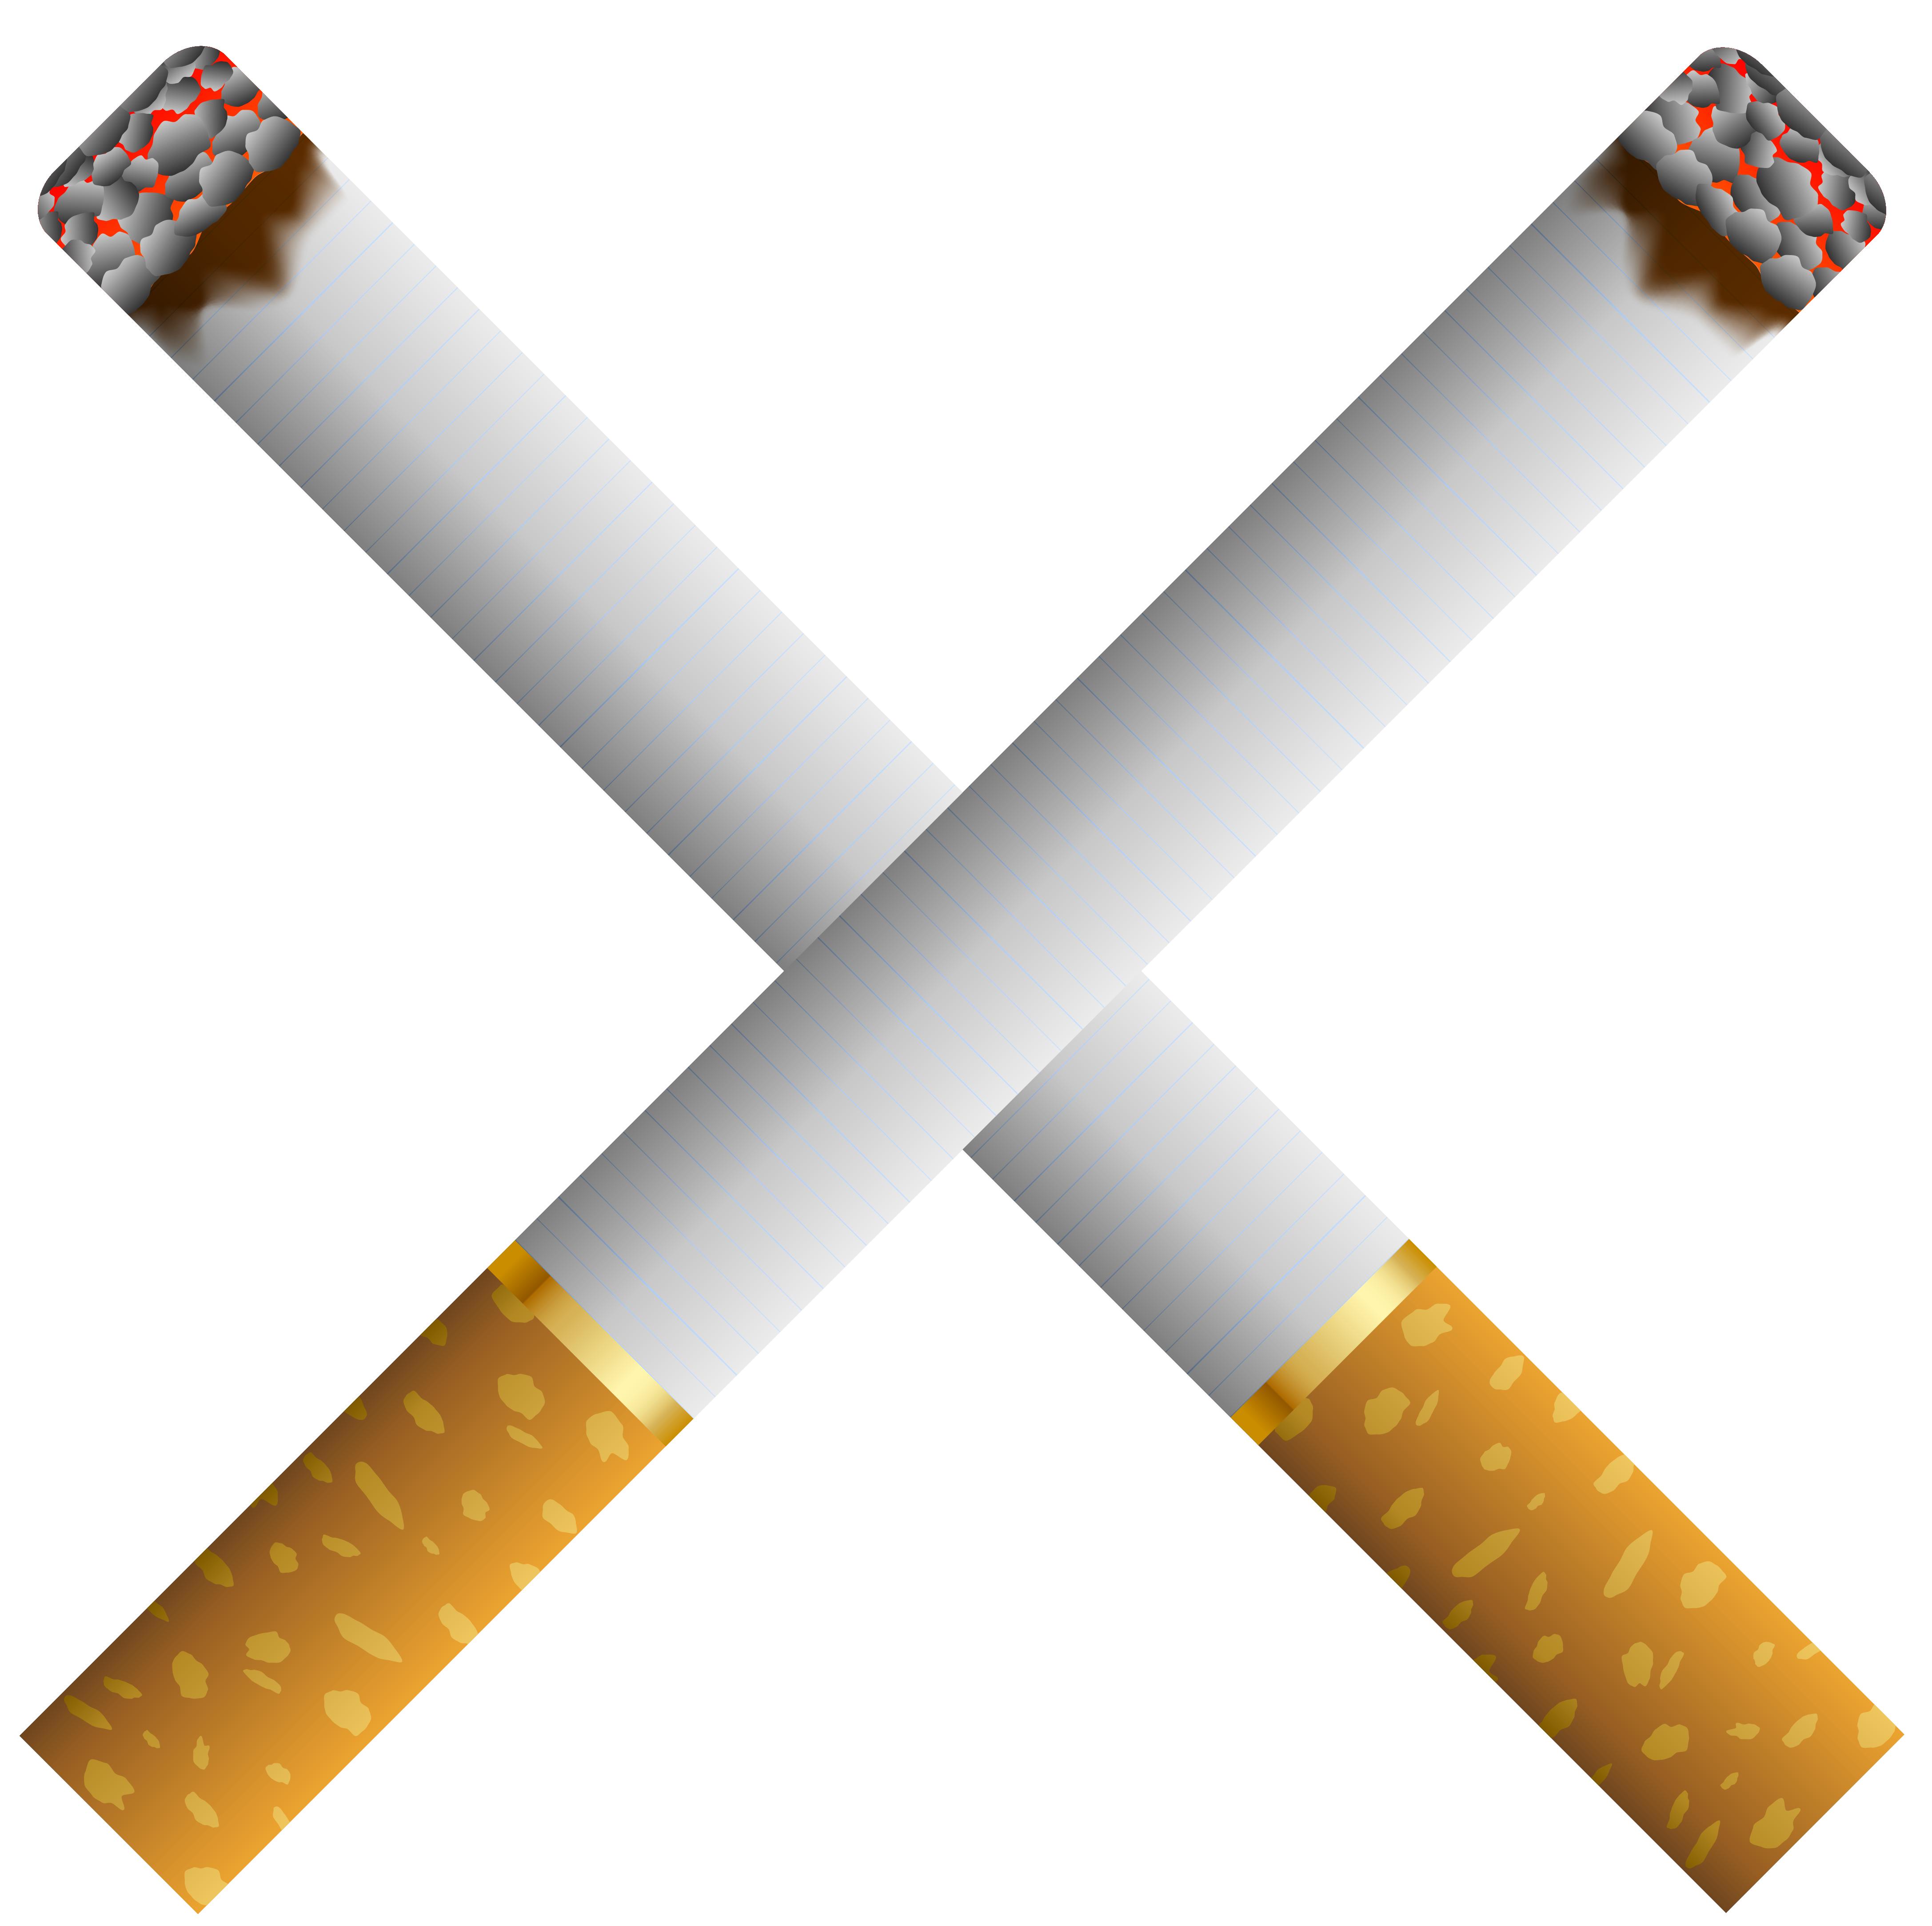 Cigar clipart pipe. Tobacco cigarette pack clip